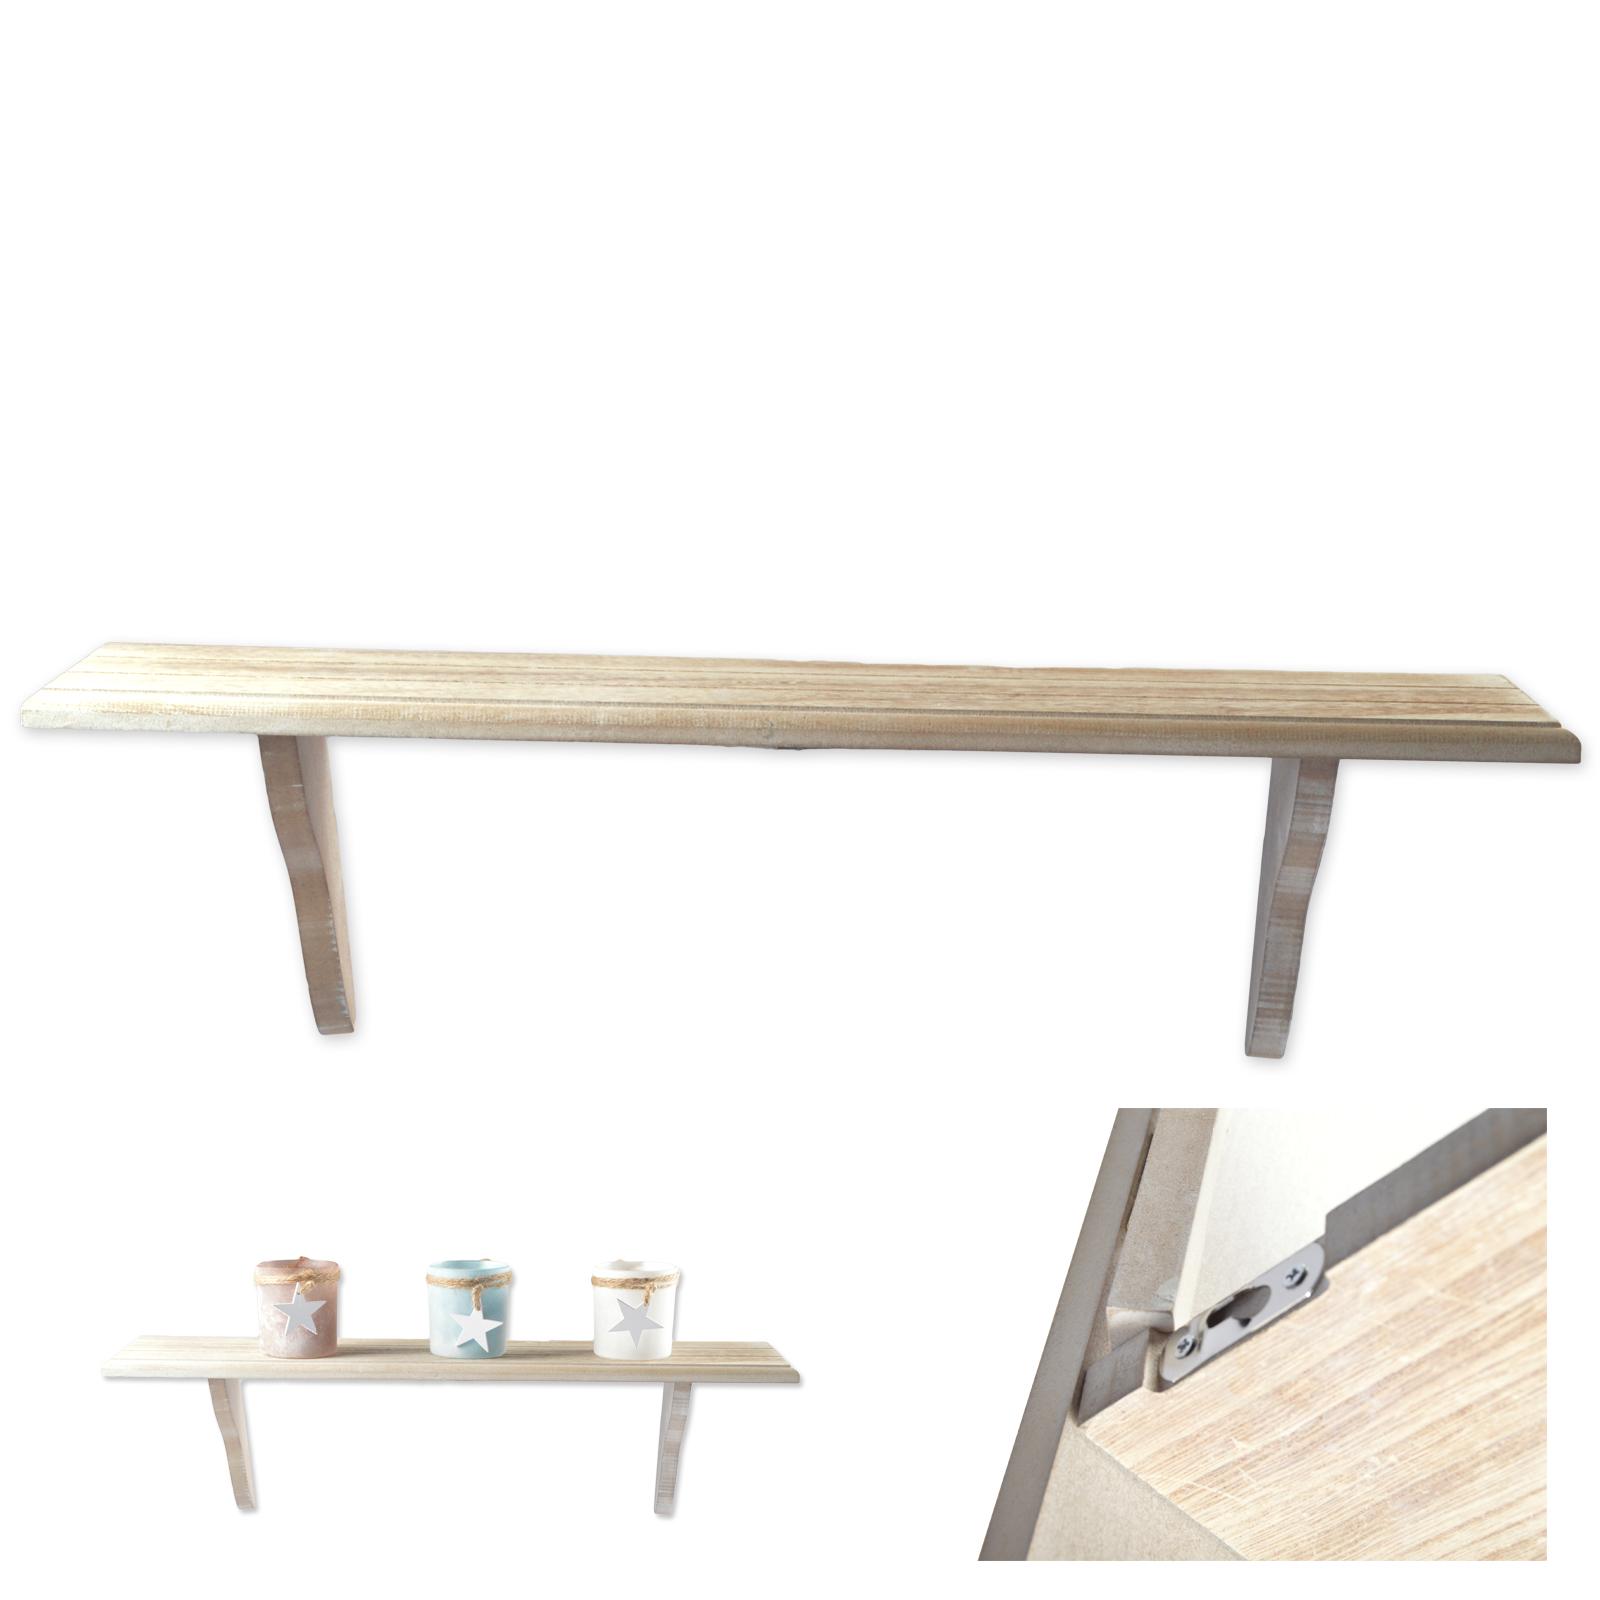 wandboard elisa wandregal h ngeregal regal b cherregal shabby chic holz ebay. Black Bedroom Furniture Sets. Home Design Ideas